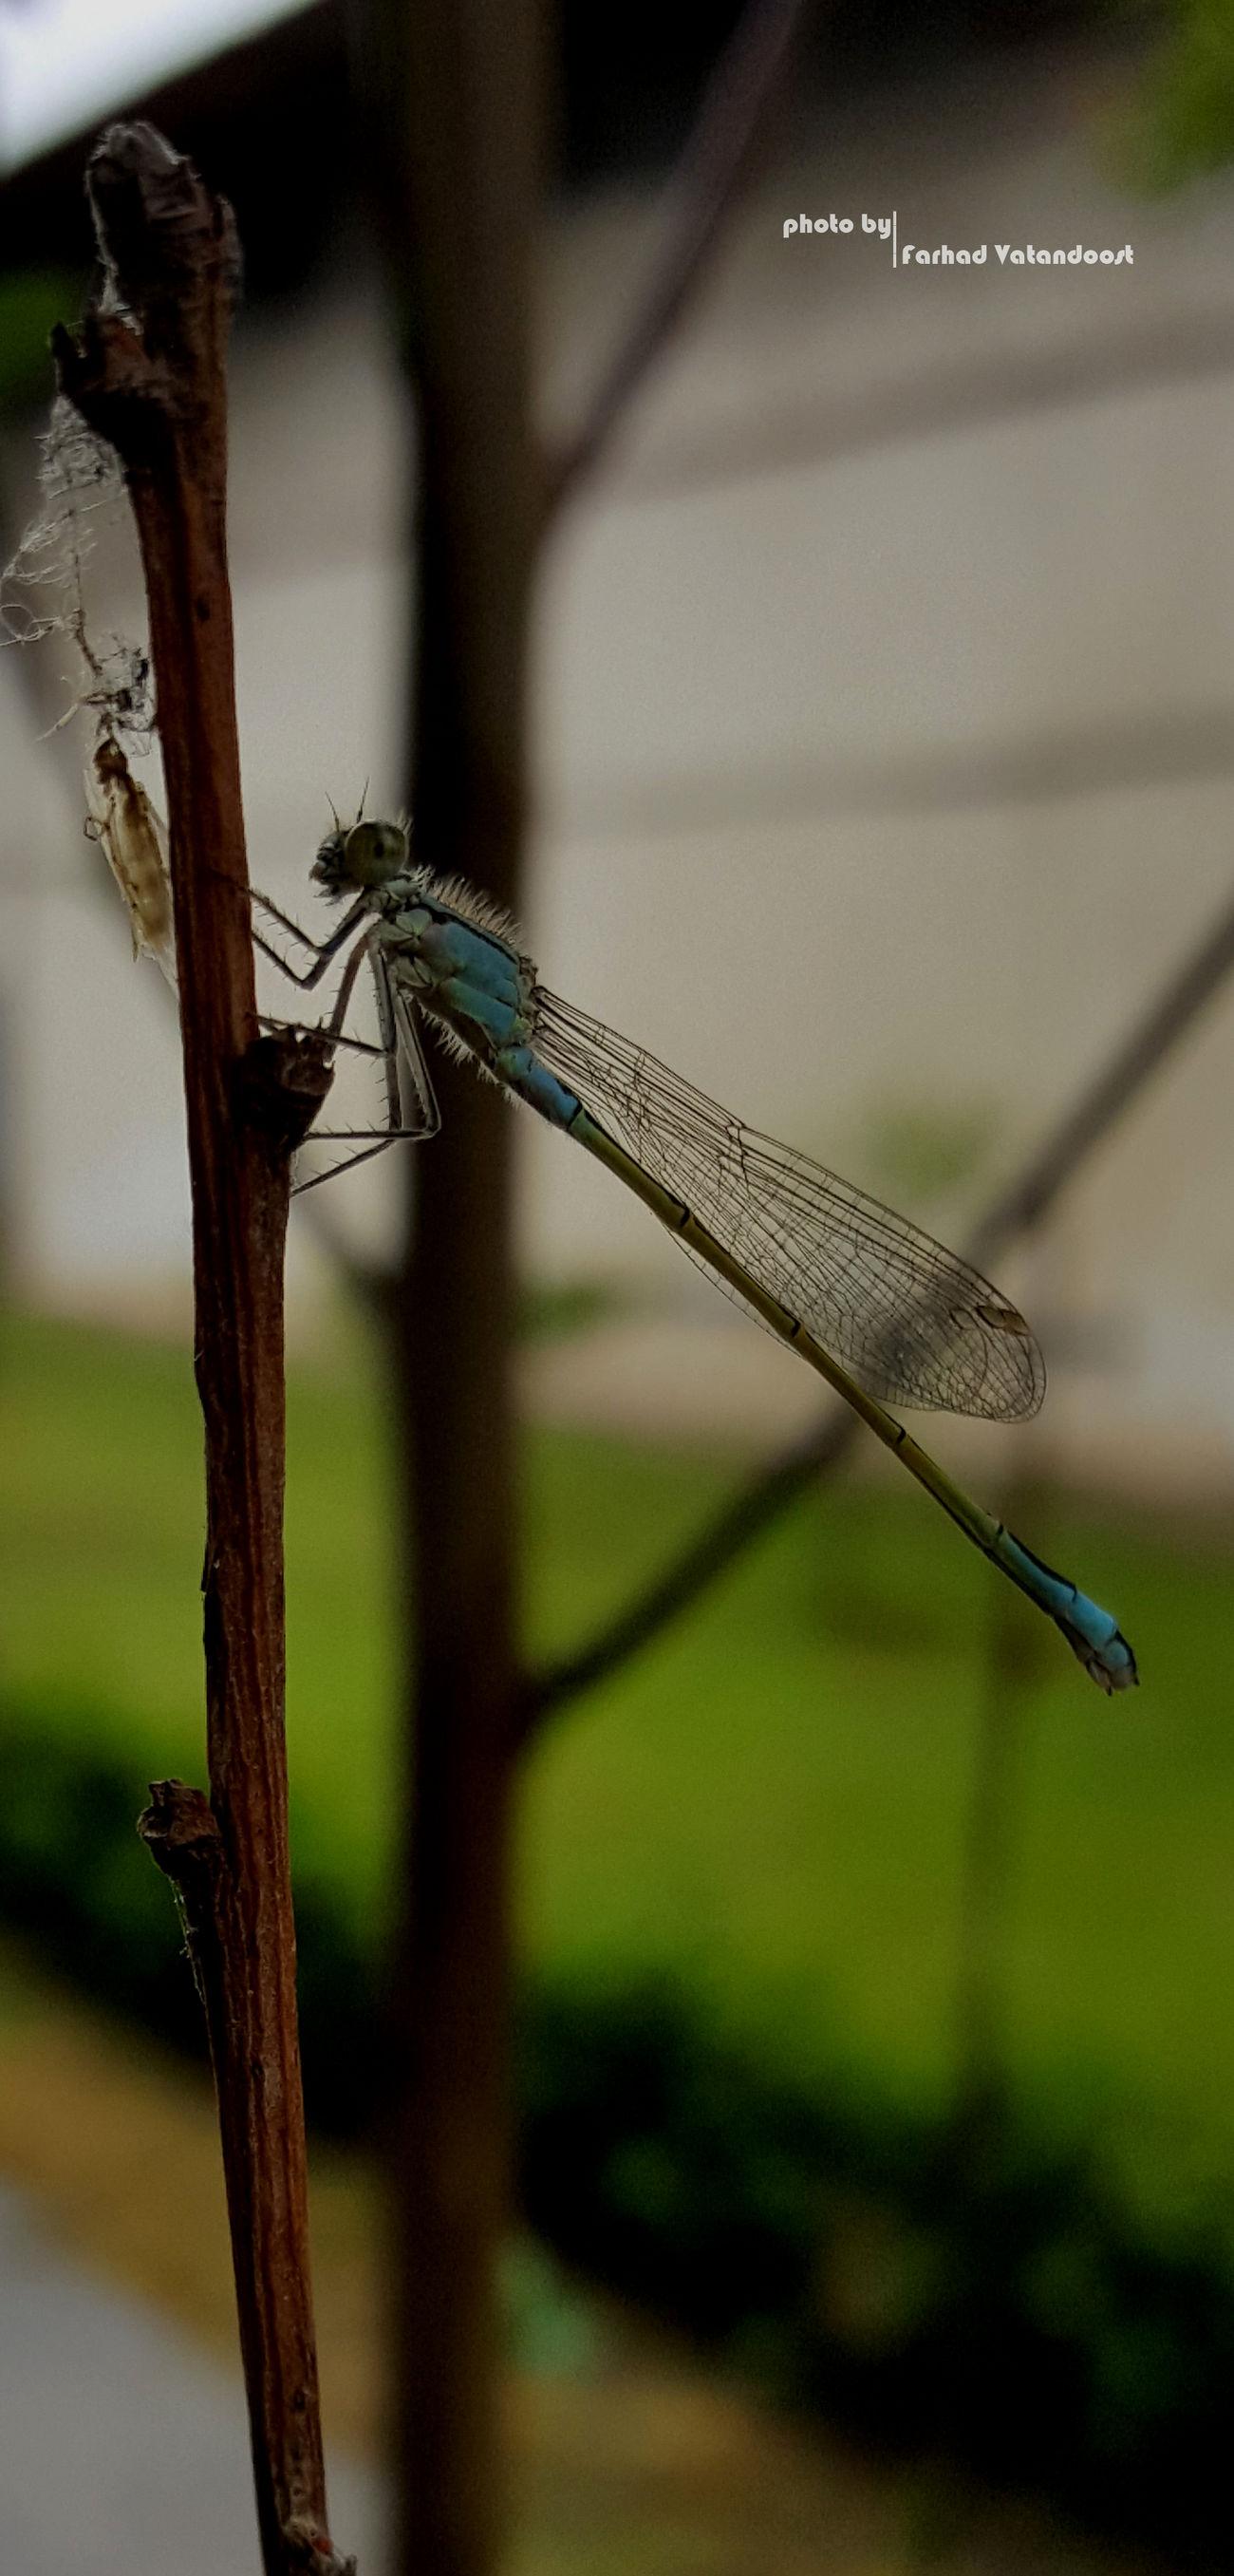 Dragonfly Dragonfly Photograohy Iran Street Photography Iran Guilin سنجاقک Samsung Galaxy S6 Edge+ Samsung Guilan 😊💝😏 Good Night Anzali,gilan, Iran بندرانزلی Samsun Samsung Galaxy S6 Edge Samsungphotography